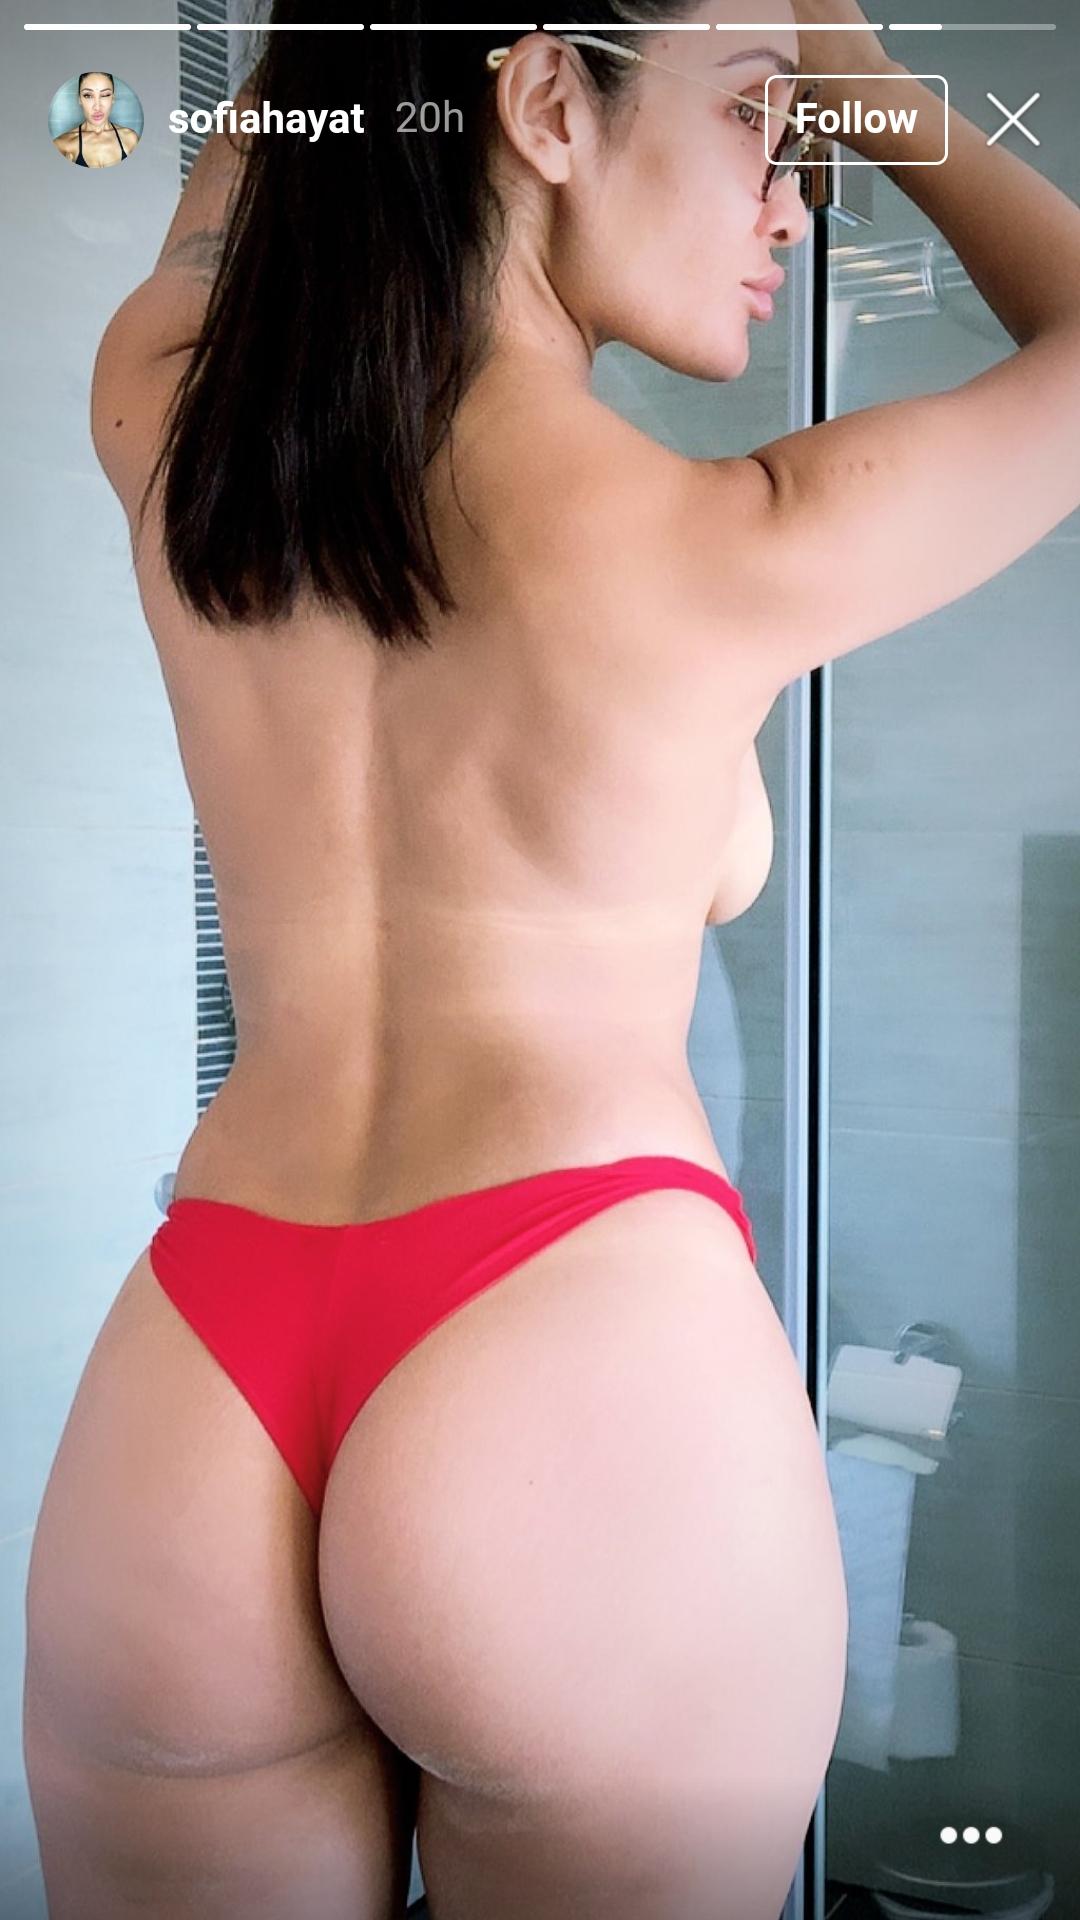 Sofia Hayat nude 2